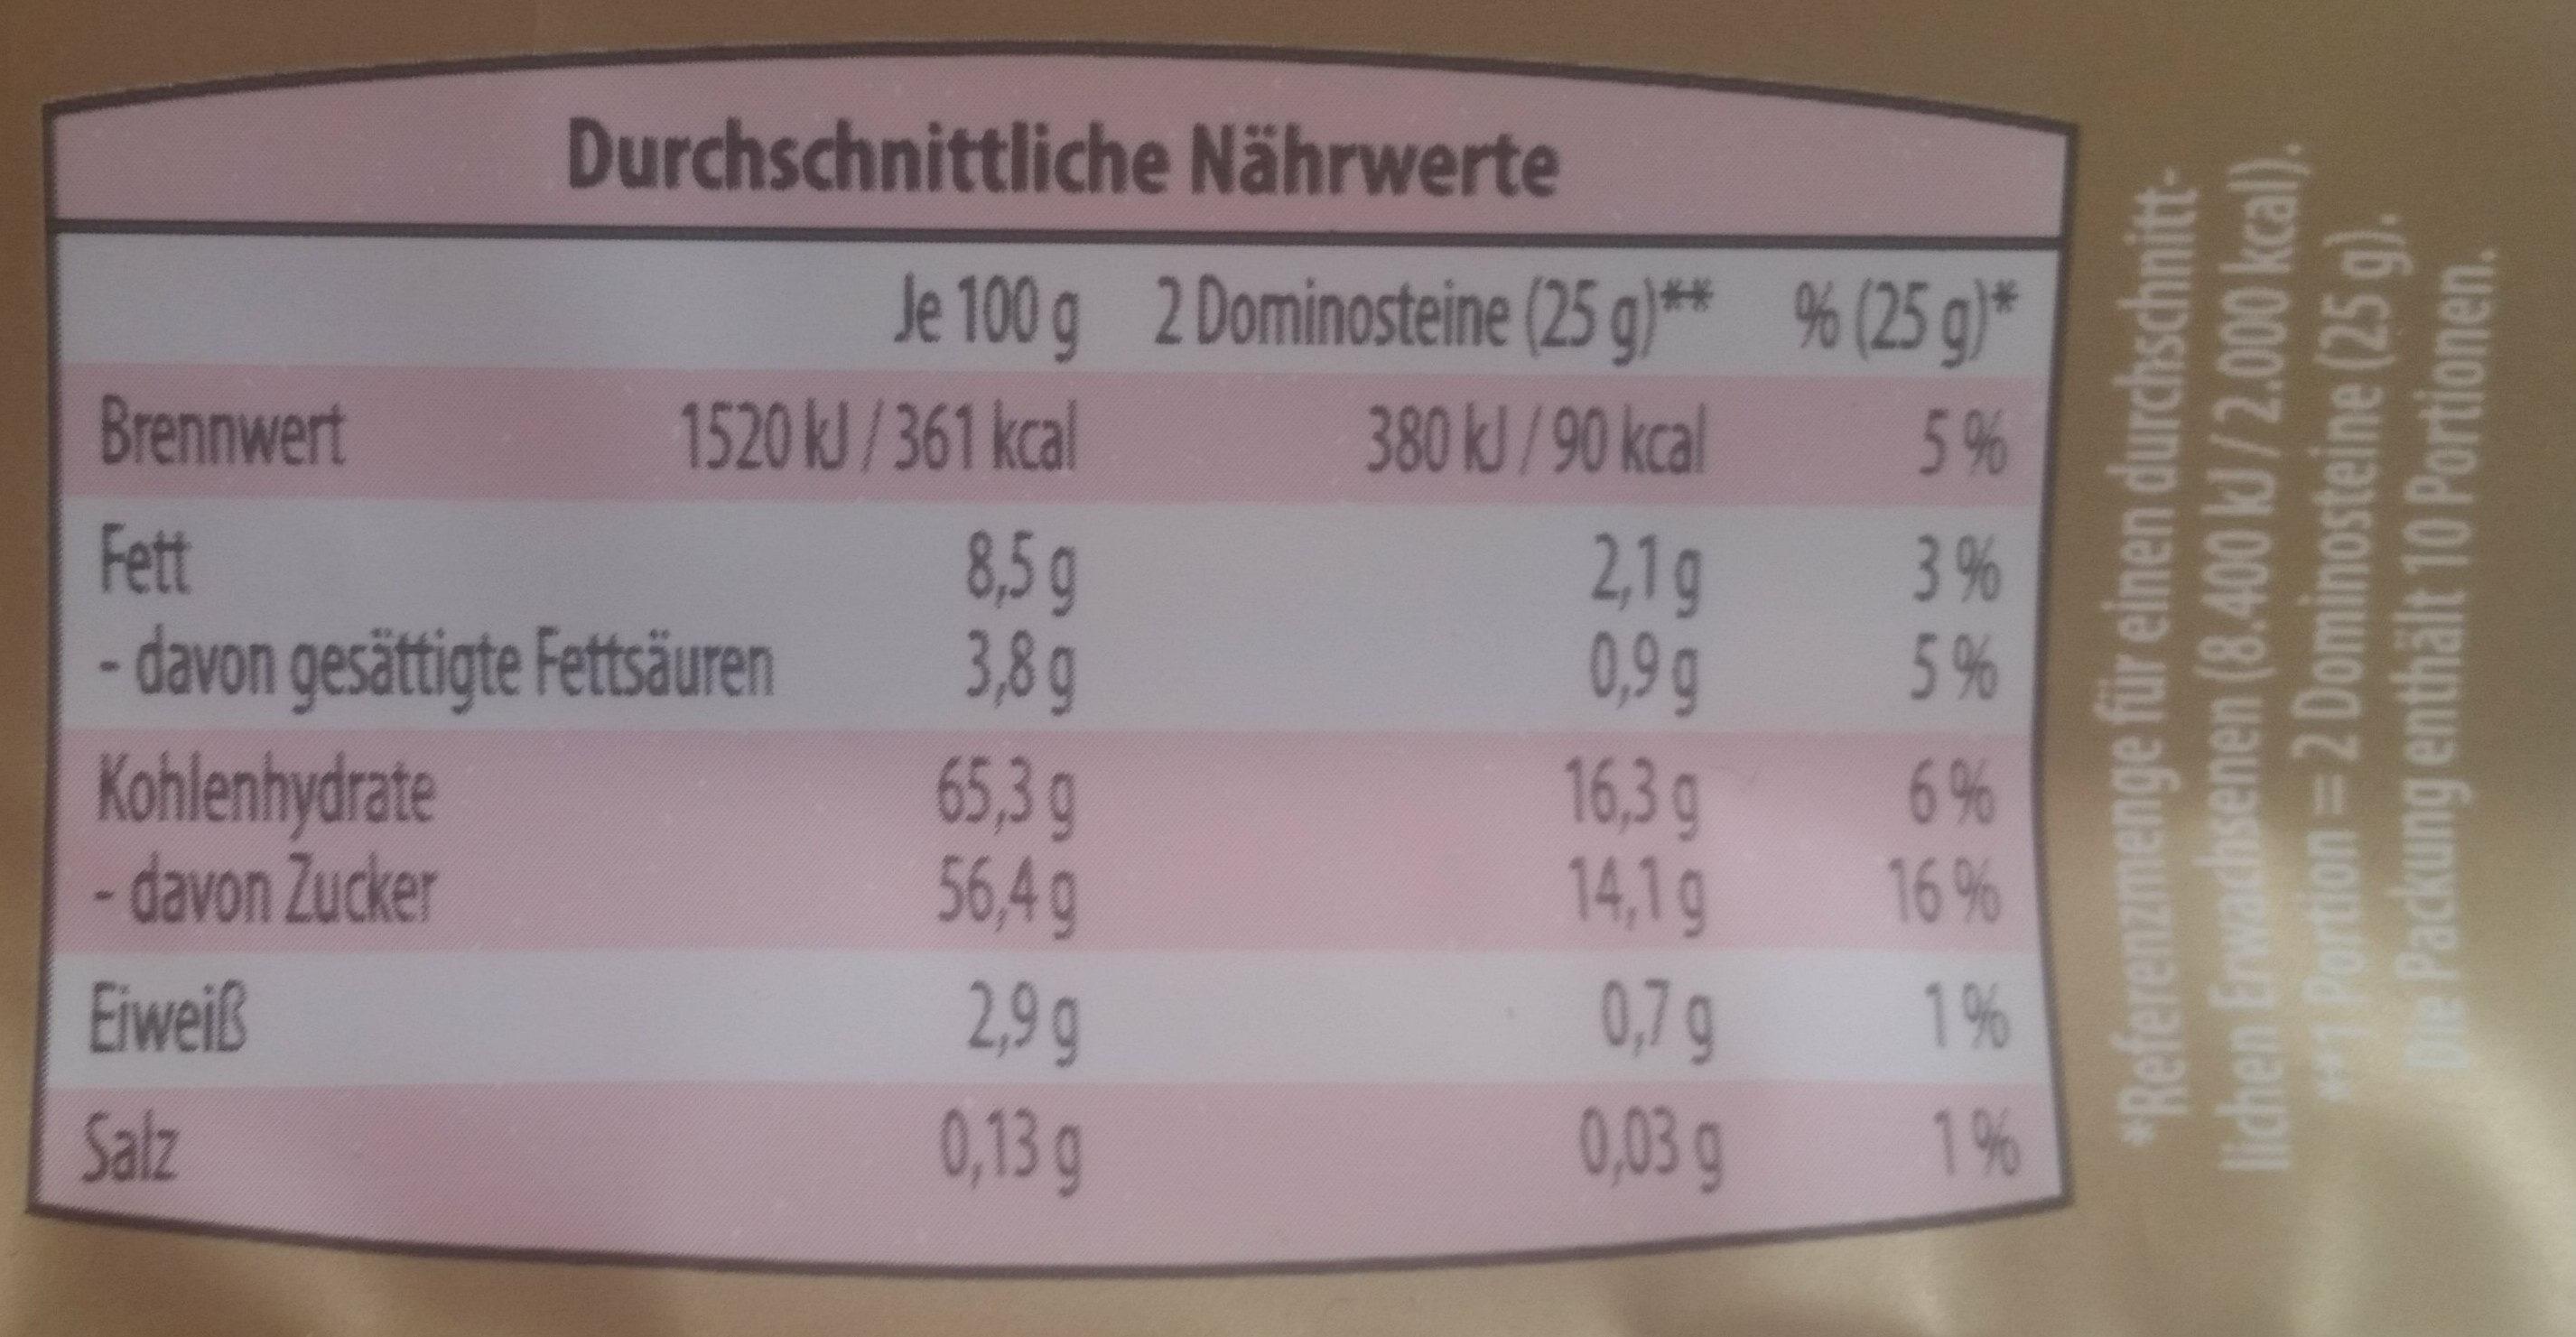 ReichsGraf pan de especias - Nutrition facts